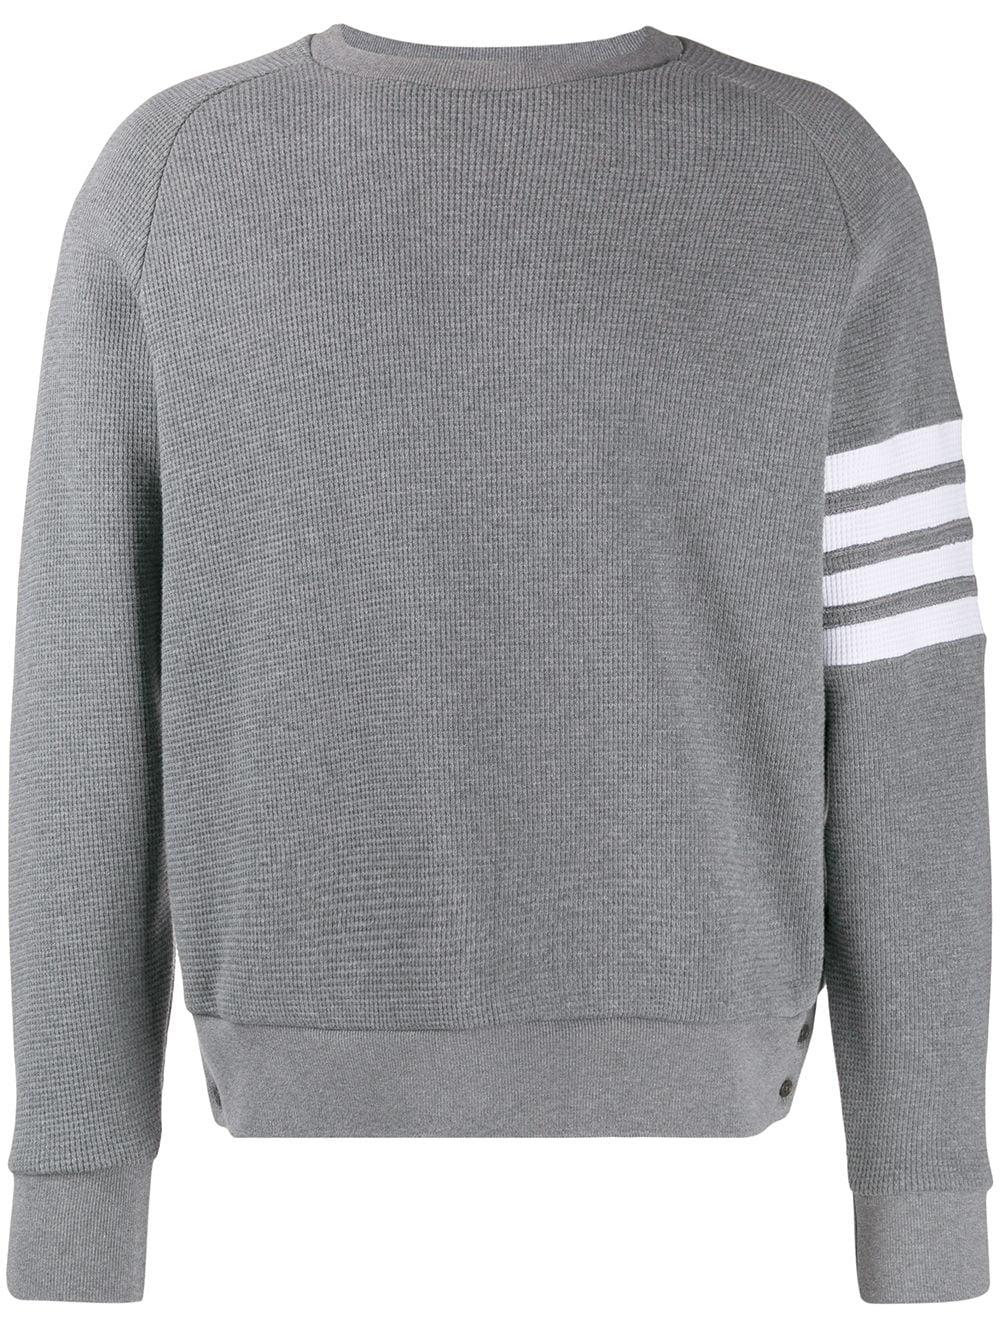 Thom Browne Sweatshirt mit Waffelmuster - Grau